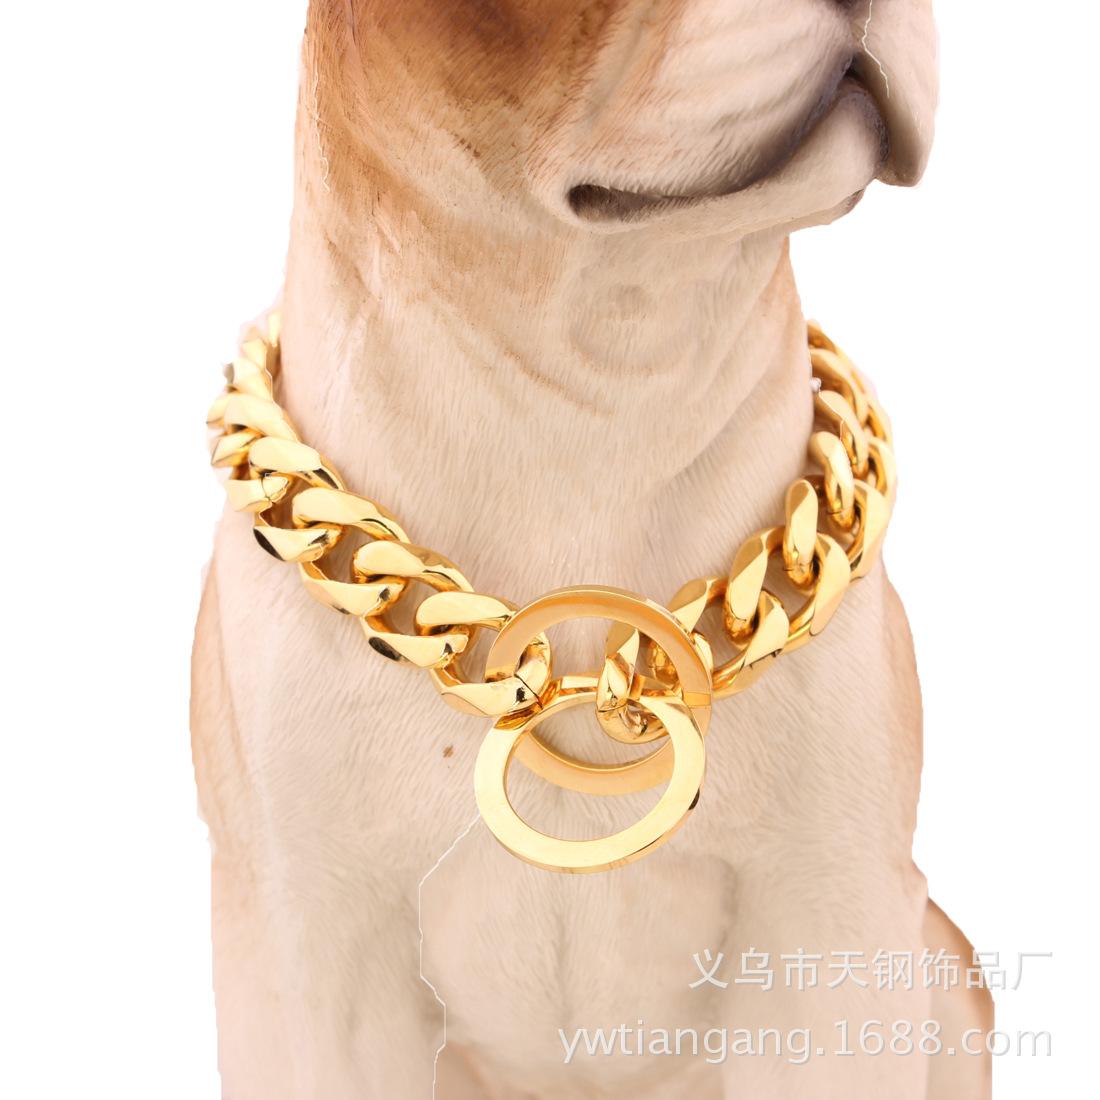 15mm亚马逊ebay热卖钛钢不锈钢金色比特犬宠物大狗链宠物链条颈圈